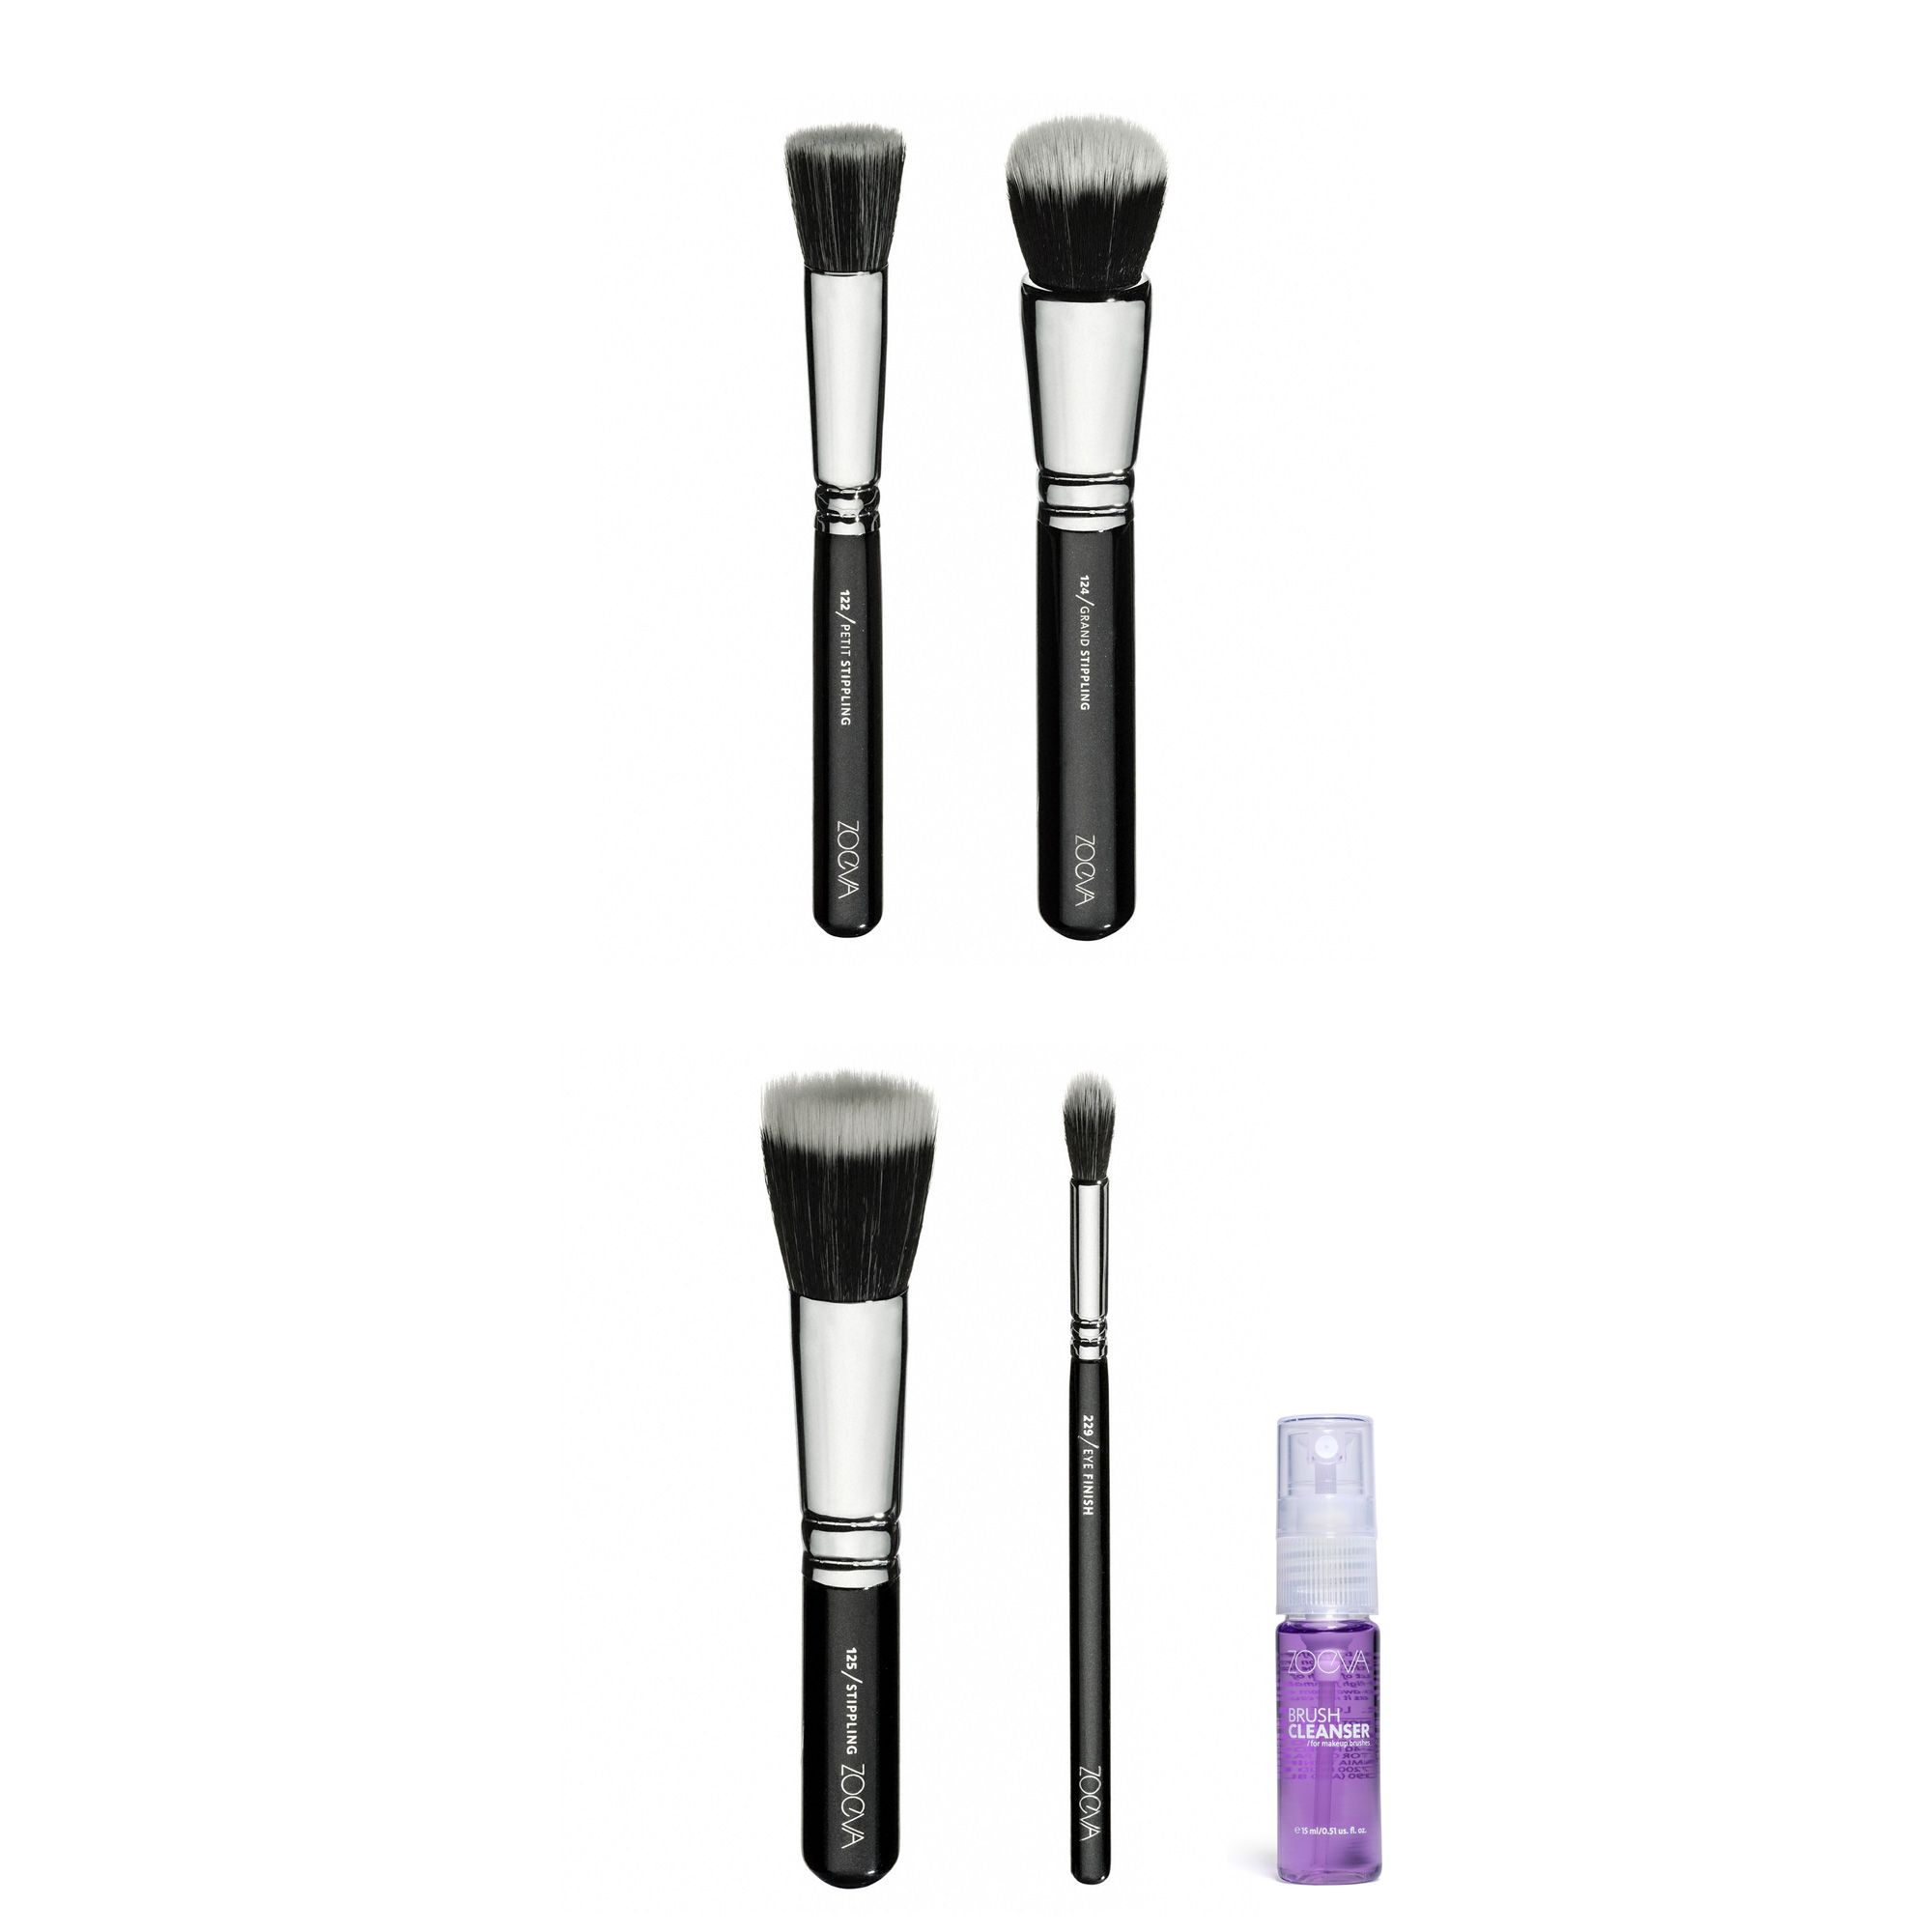 ZOEVA Stippling Set Quality makeup, Cosmetic sets, Makeup